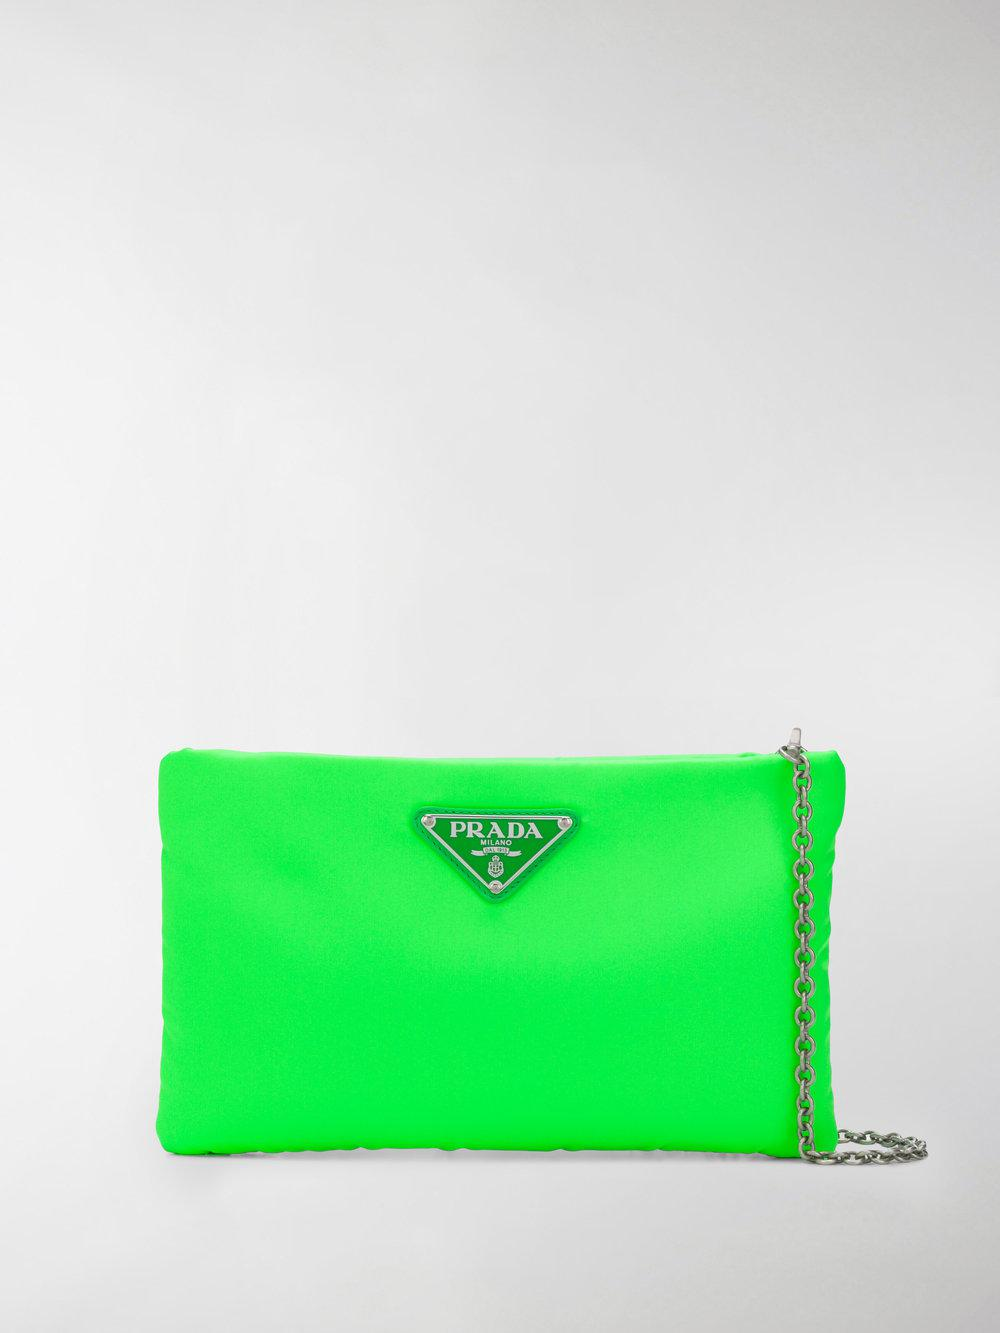 3258f77d1ad9b8 Prada Padded Nylon Clutch Bag in Green - Lyst